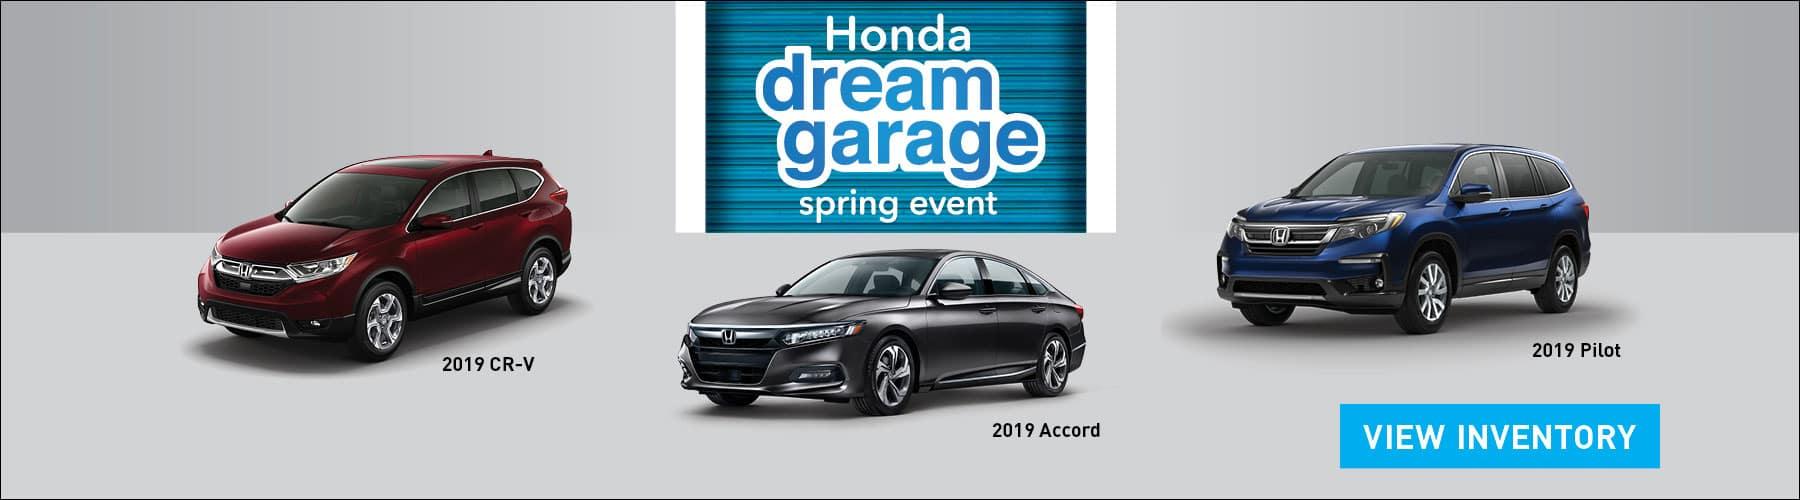 Honda Dream Garage